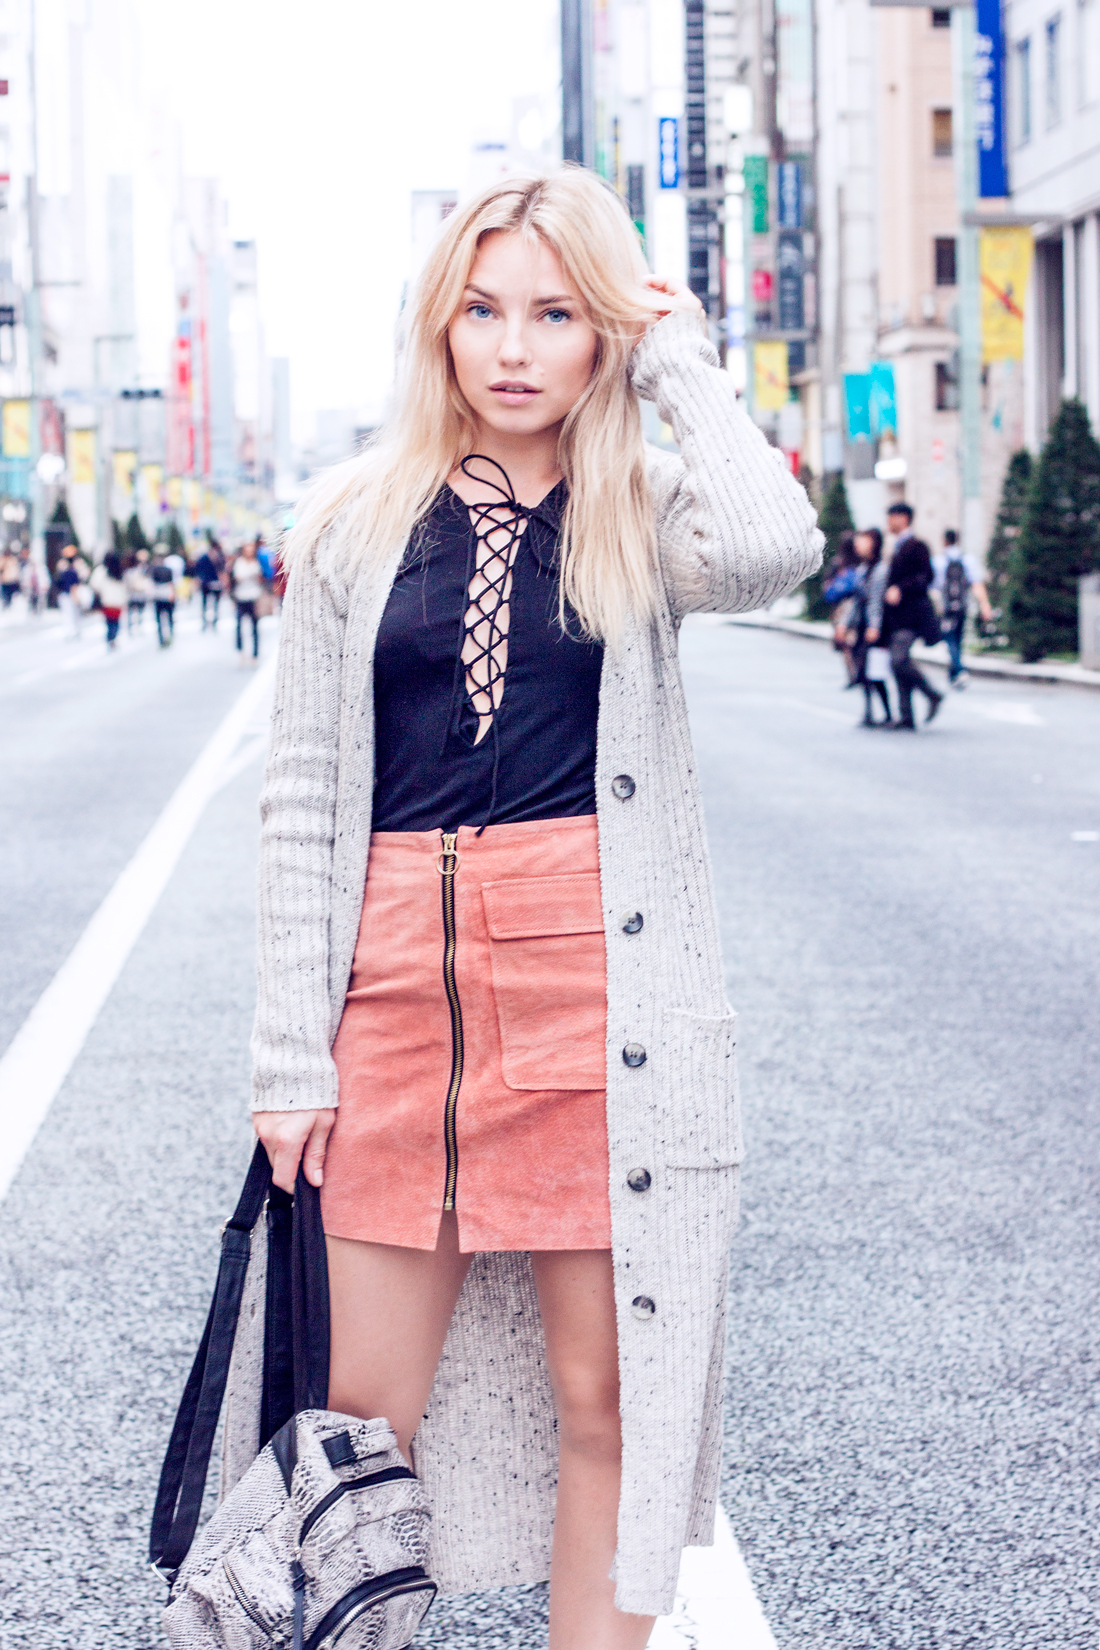 Lace up top, suede skirt, croco backpack, ginza chuo dori, tokyo fashion, tokyo fashion blog, tokyo travel blog, tokyo sightseeing, knits tokyo, japan, ginza tokyo, japanese umbrella, wagasa umbrella